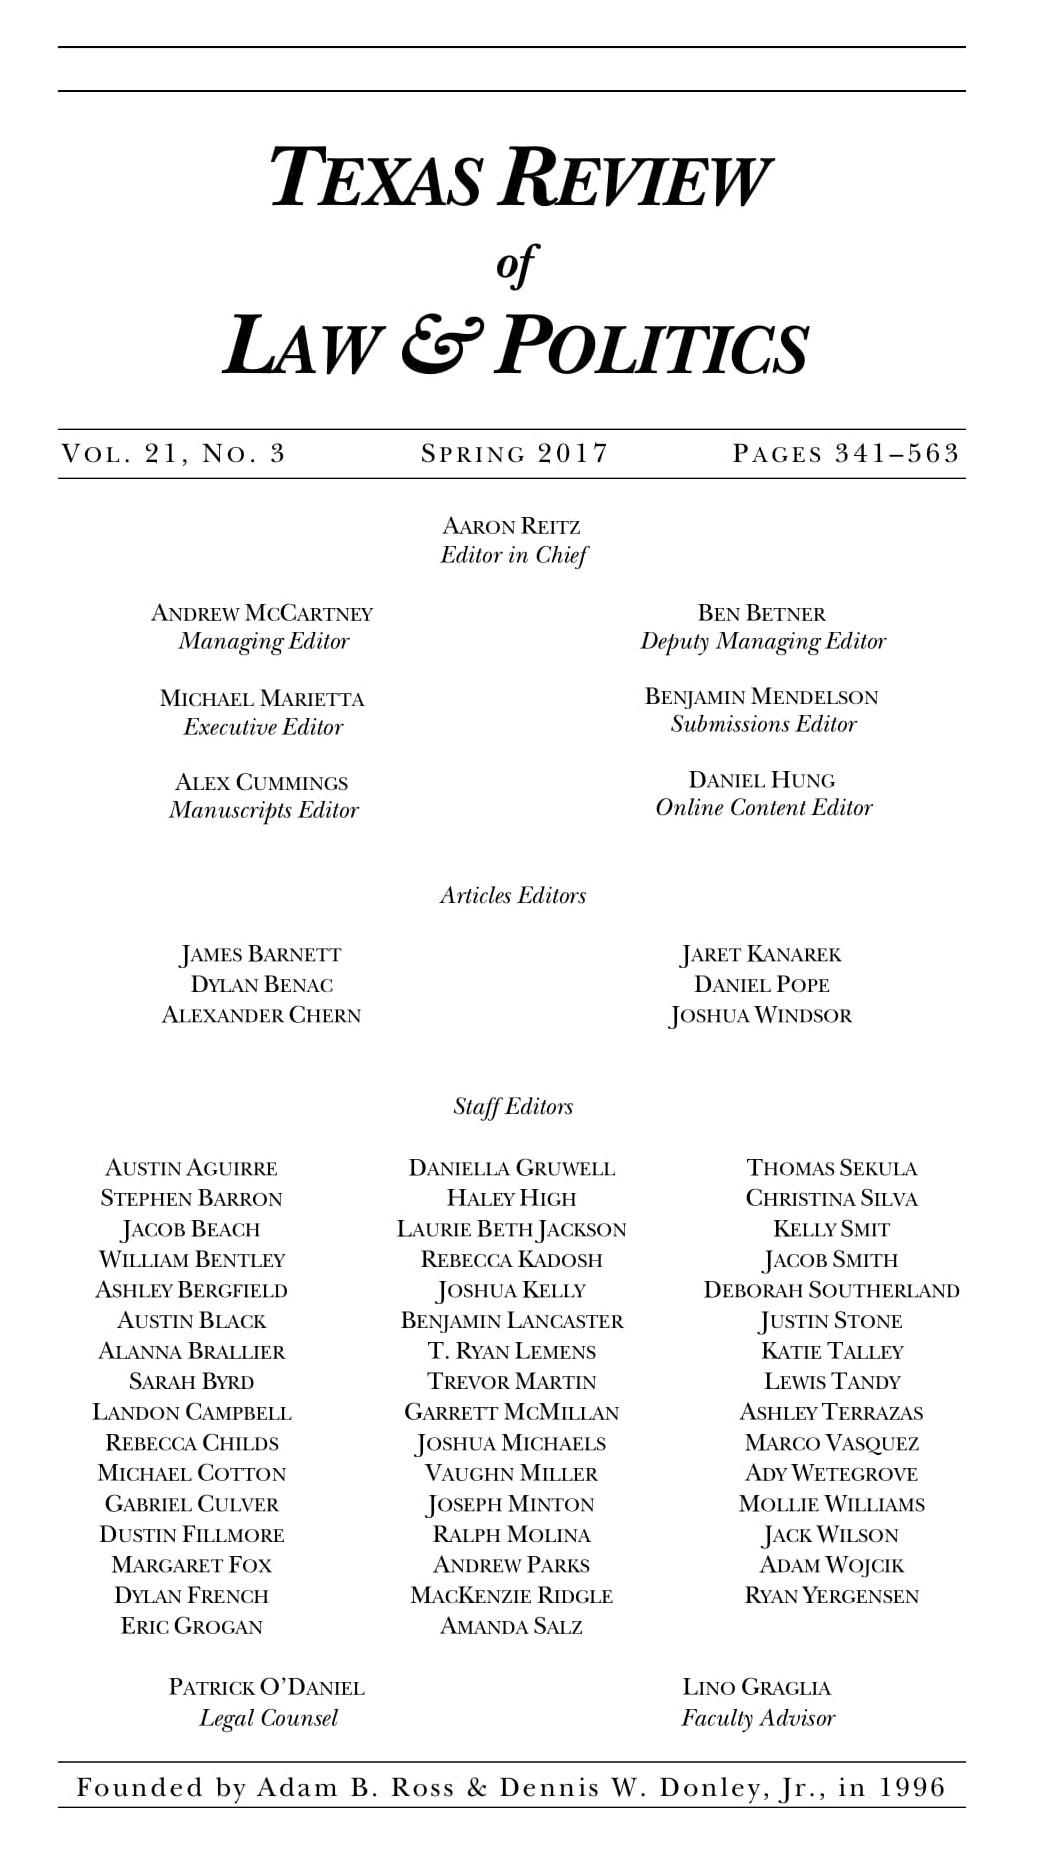 Vol 21 No 3